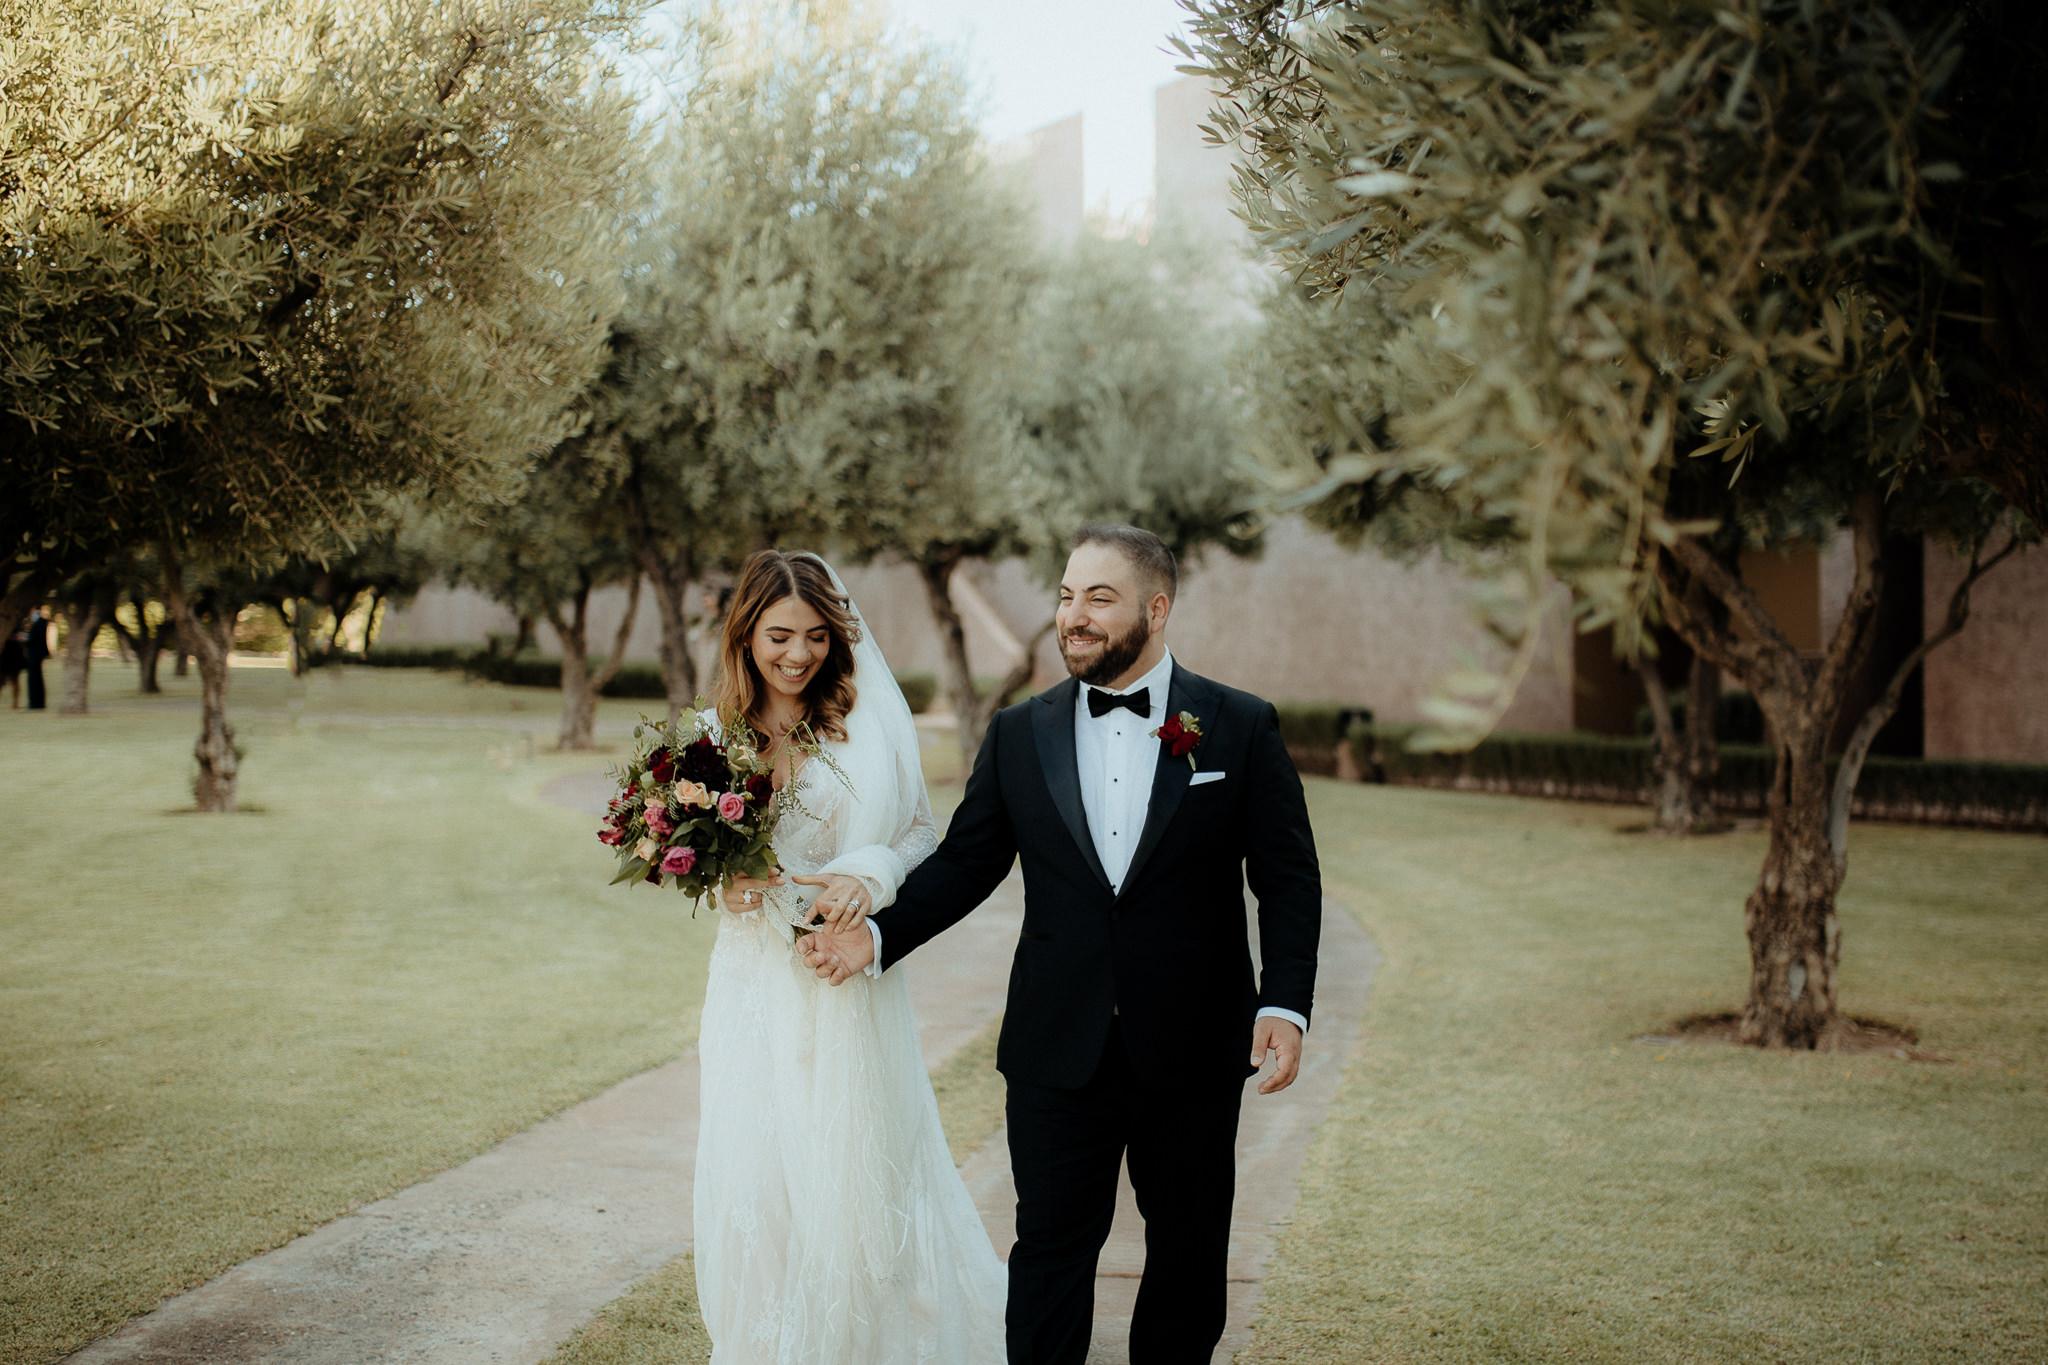 160924 Reem and Janai Wedding.jpg